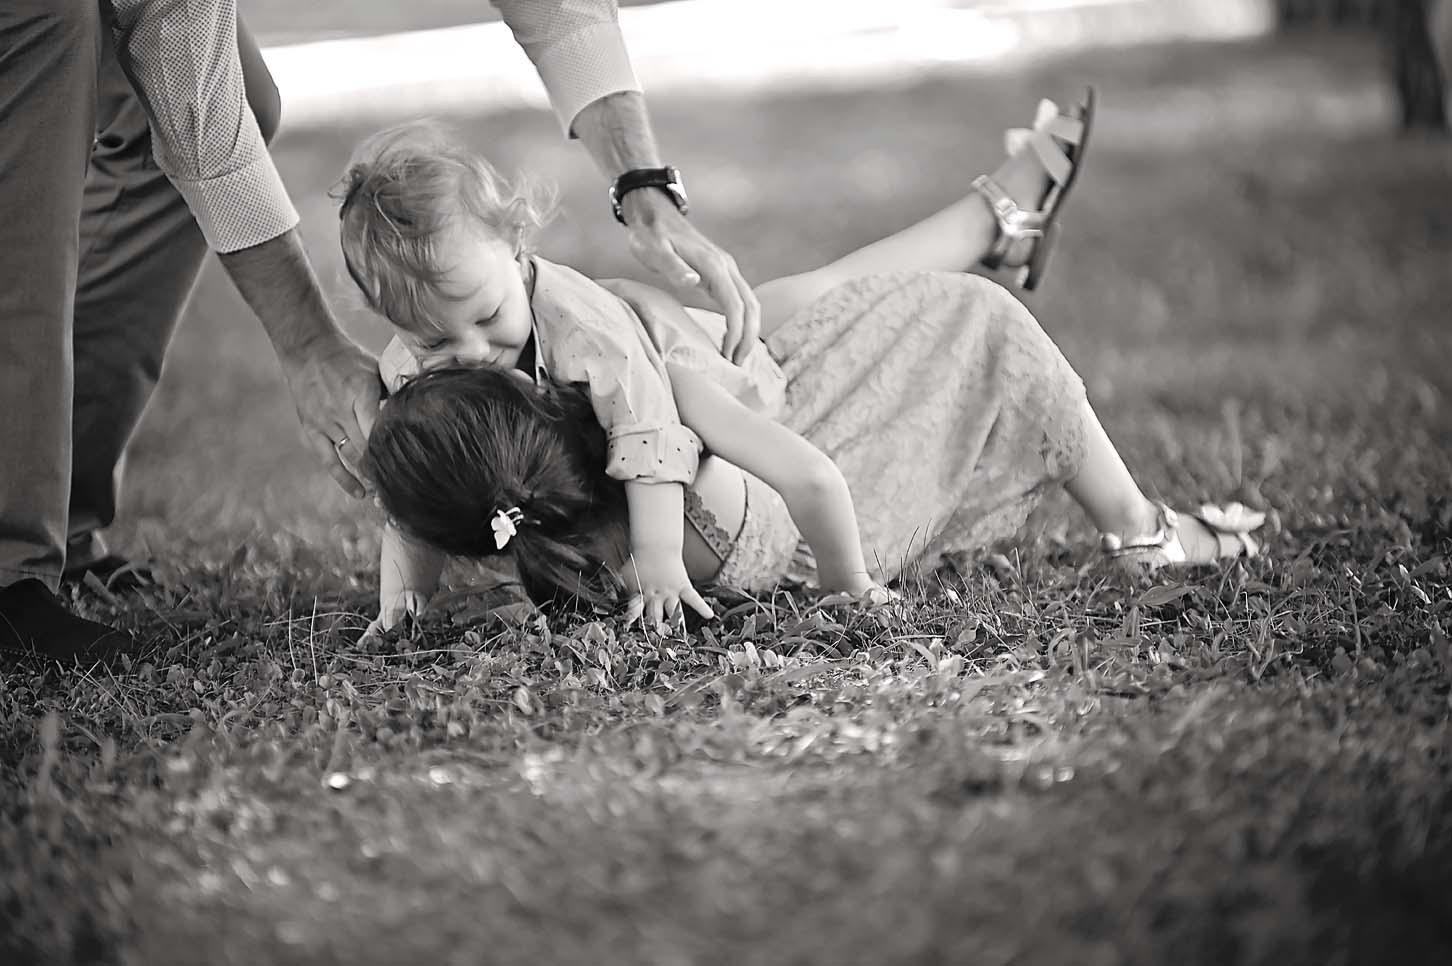 mum-son -family-portraits -l arissa-alexis-koumaditis-photography-04